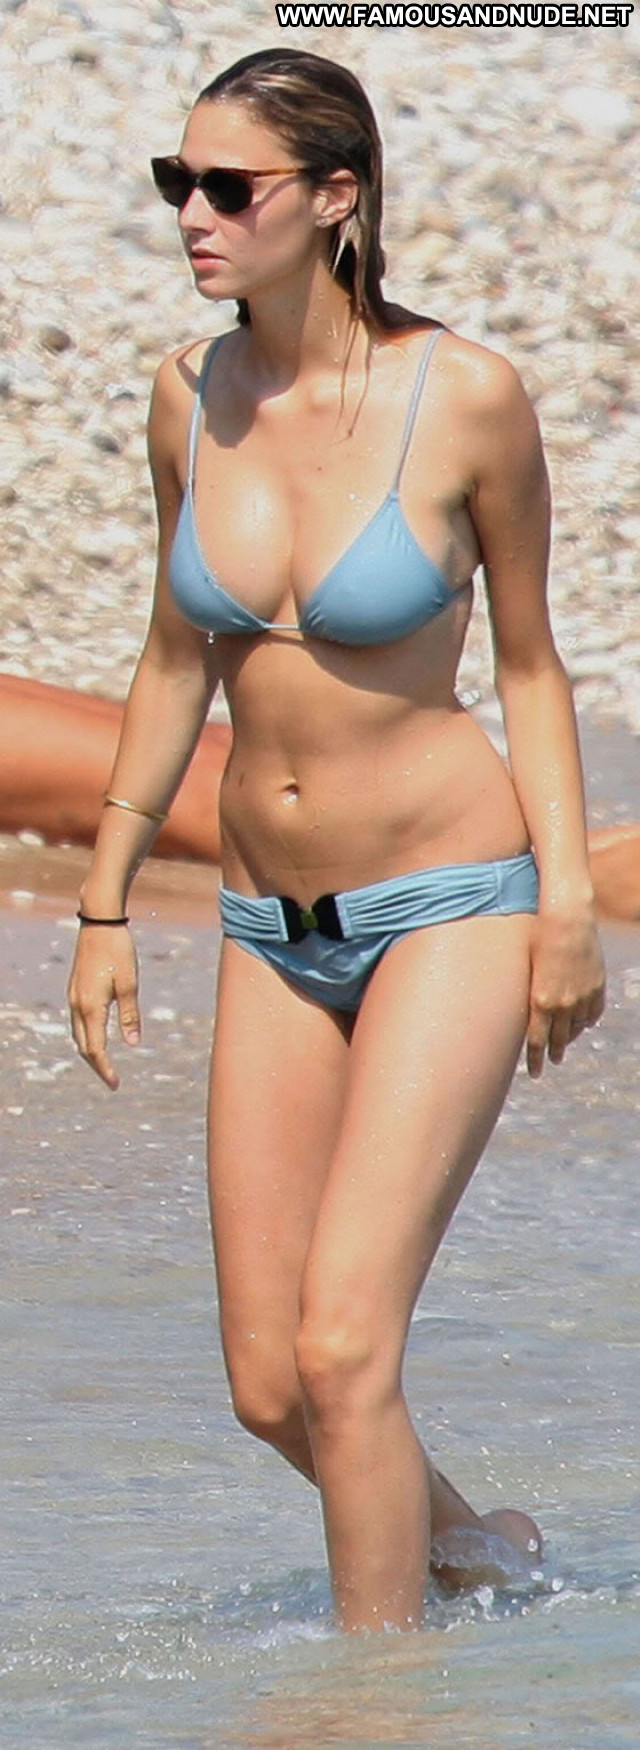 Beatrice Borromeo Babe Beautiful Posing Hot Celebrity Nude Scene Sexy